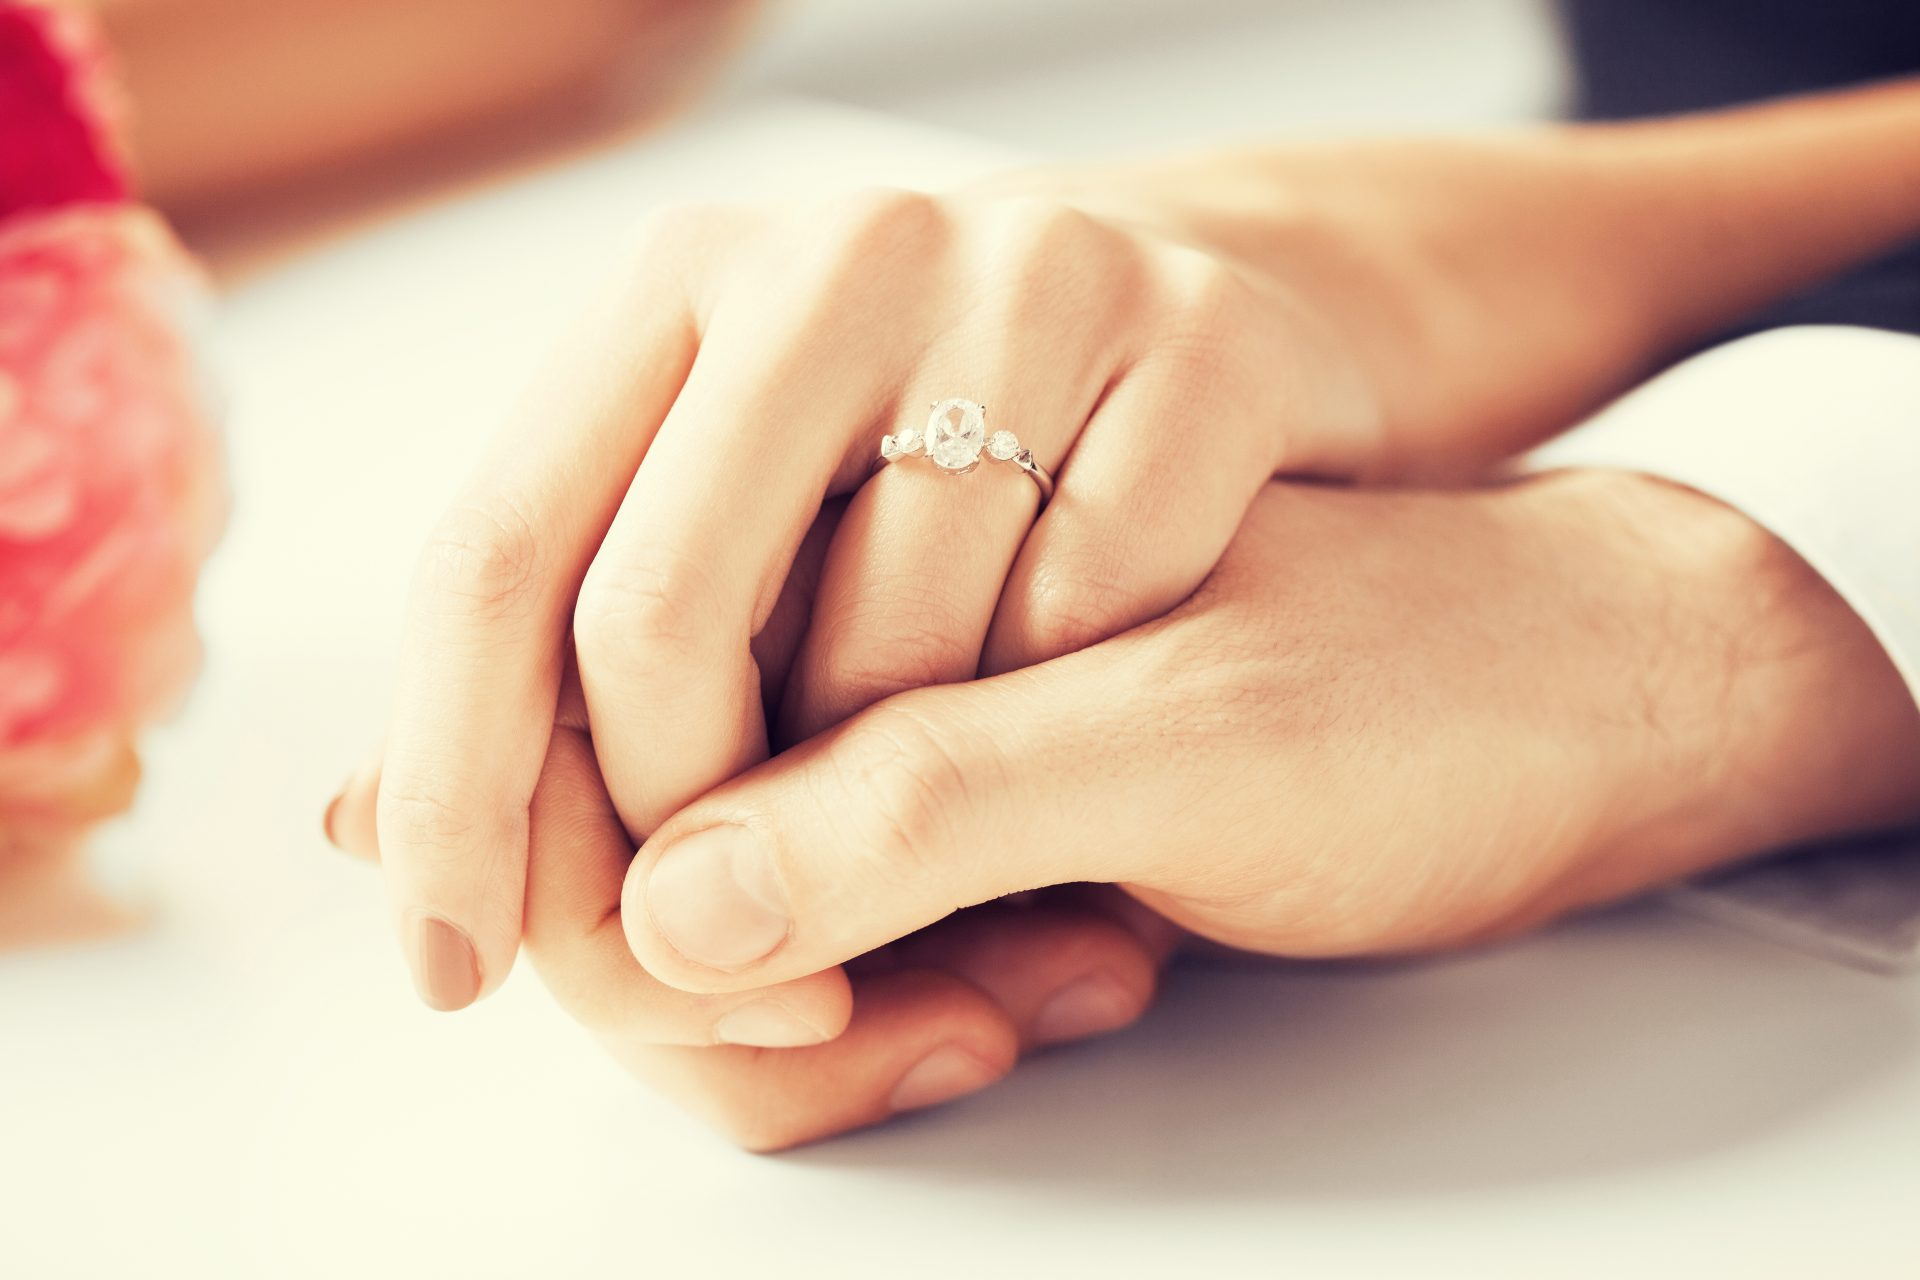 Suami Mengaku Dirinya Curang, Wajarkah Isteri Memaafkan Dan Beri Peluang Kedua?